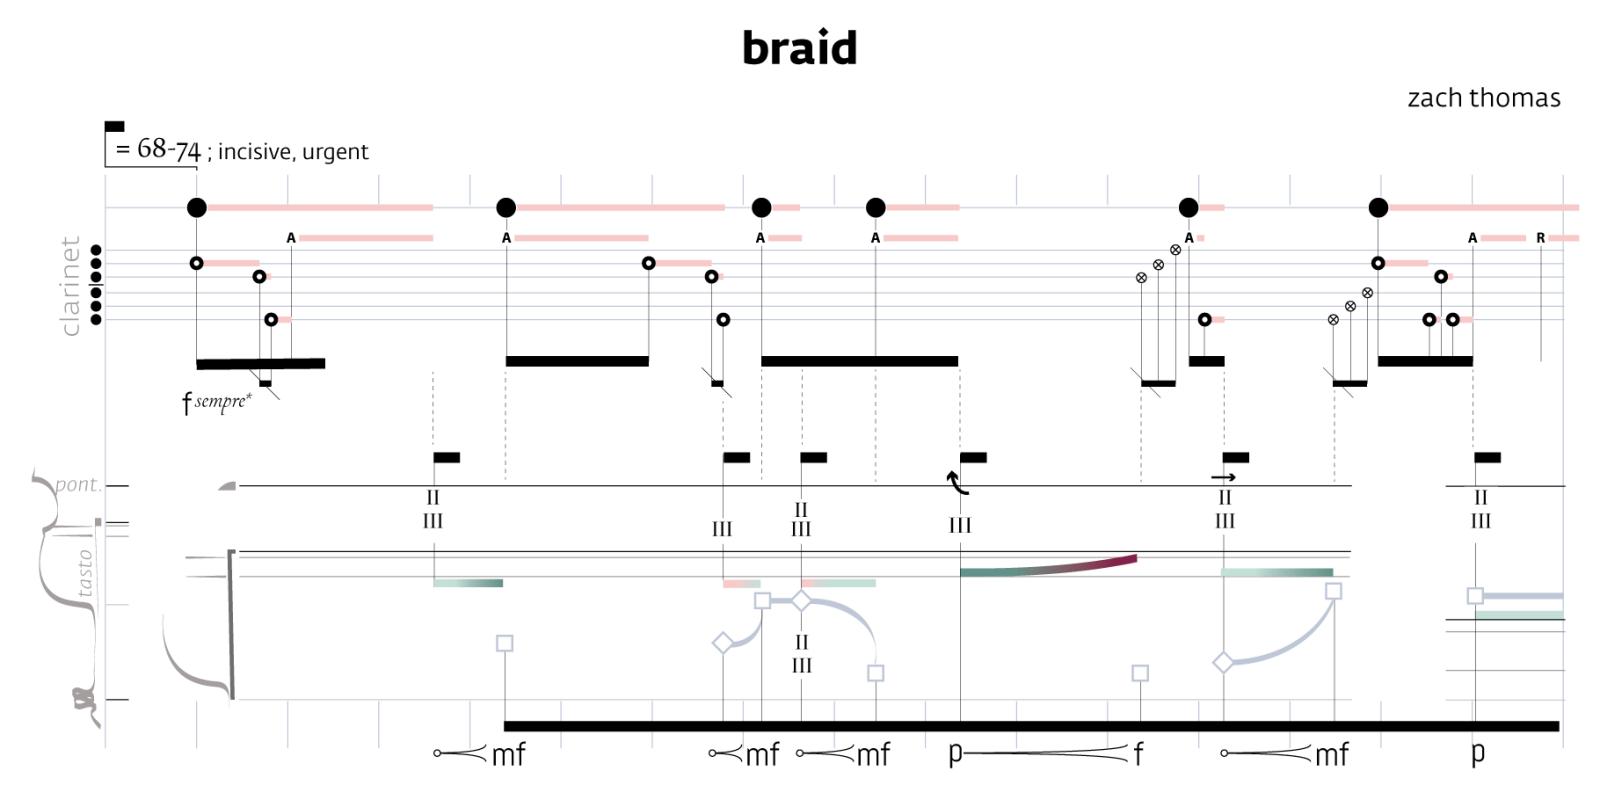 braid (#1)